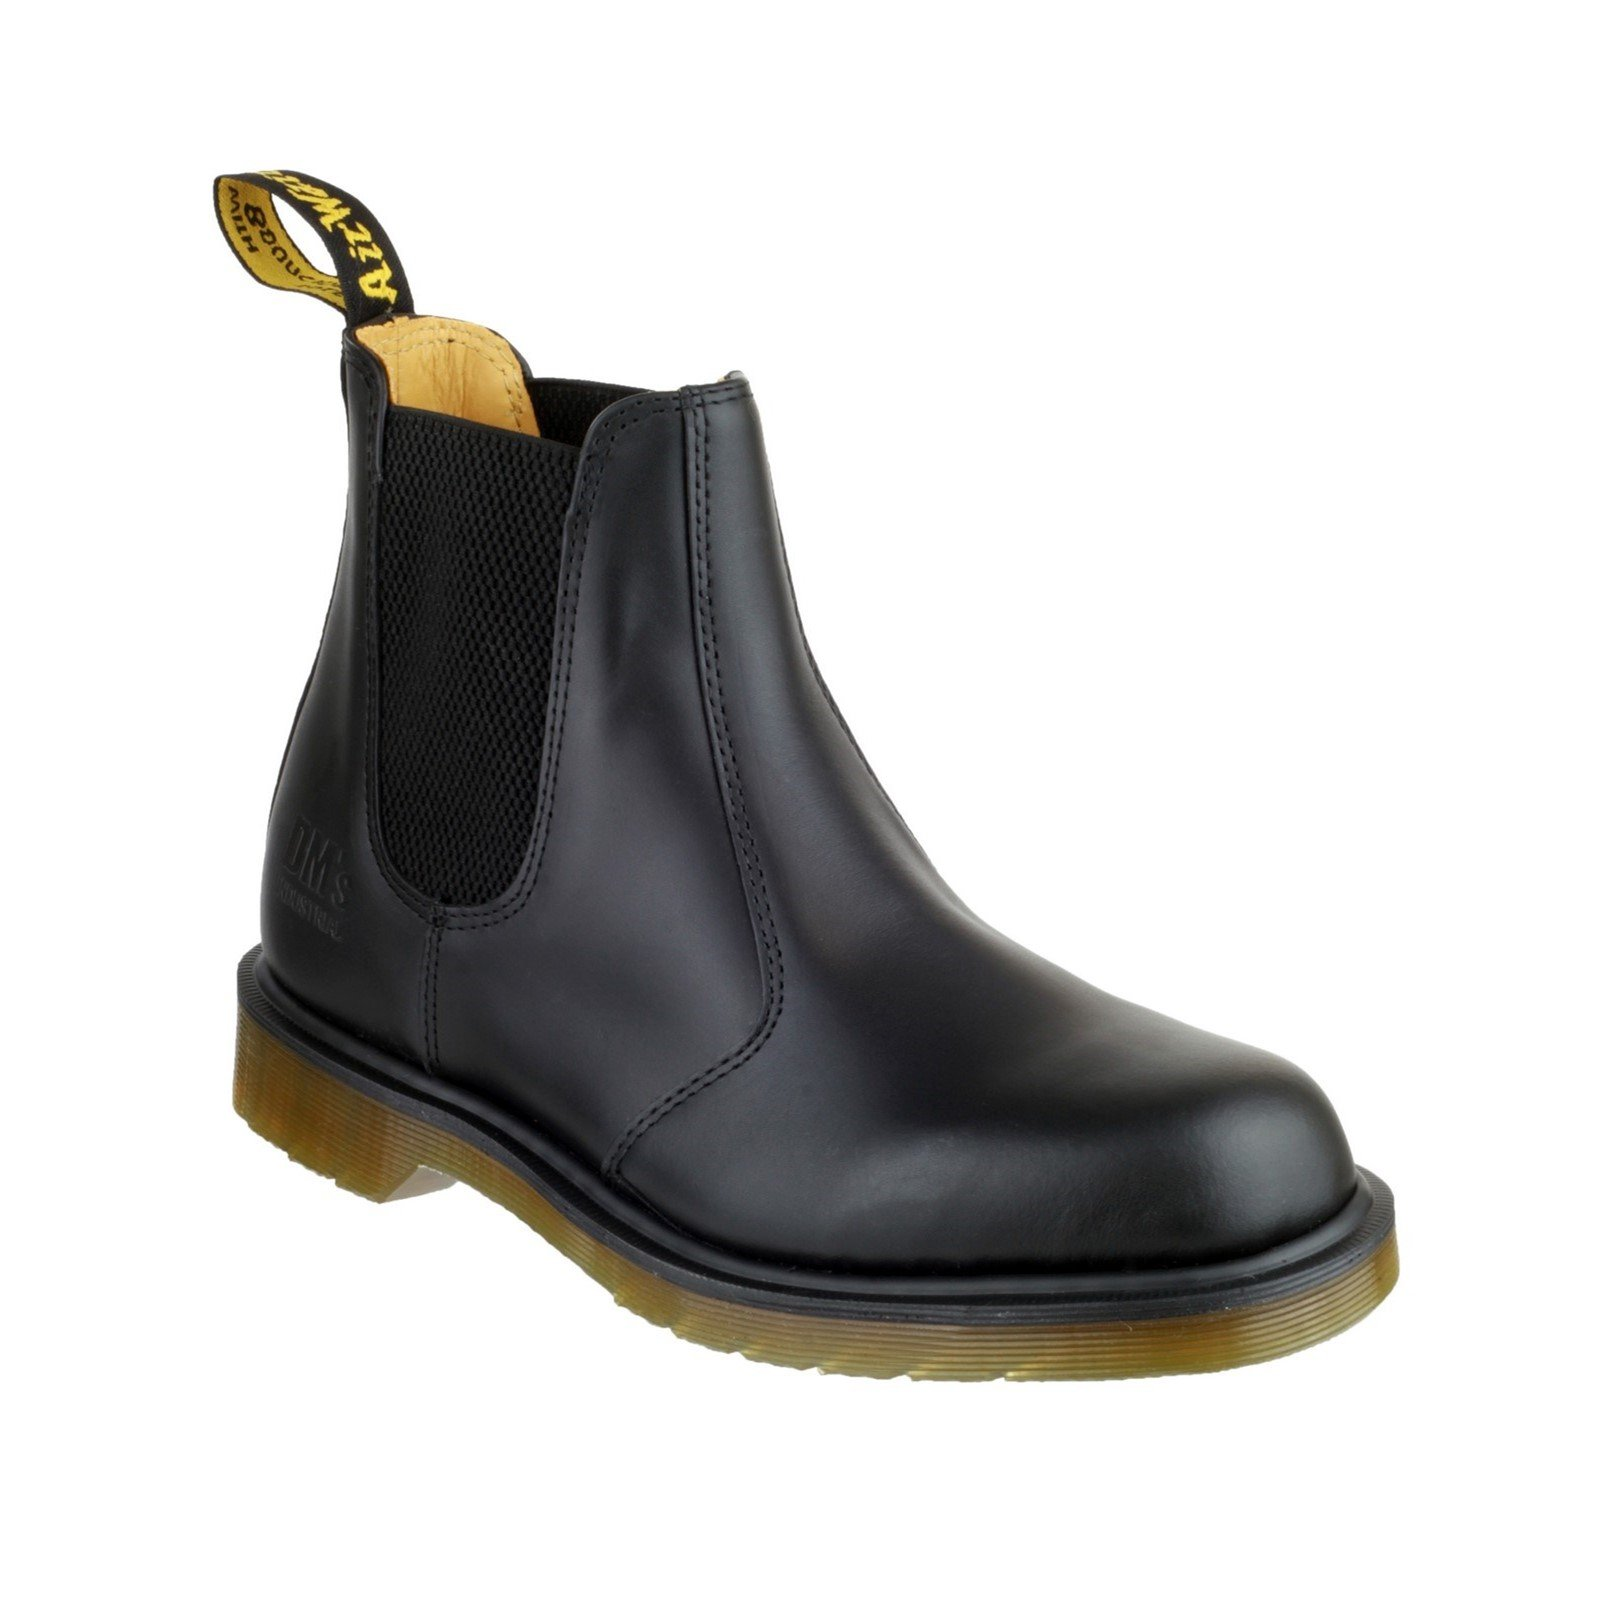 Dr Martens Men's Slip-On Dealer Boot Black 04916 - Black 12